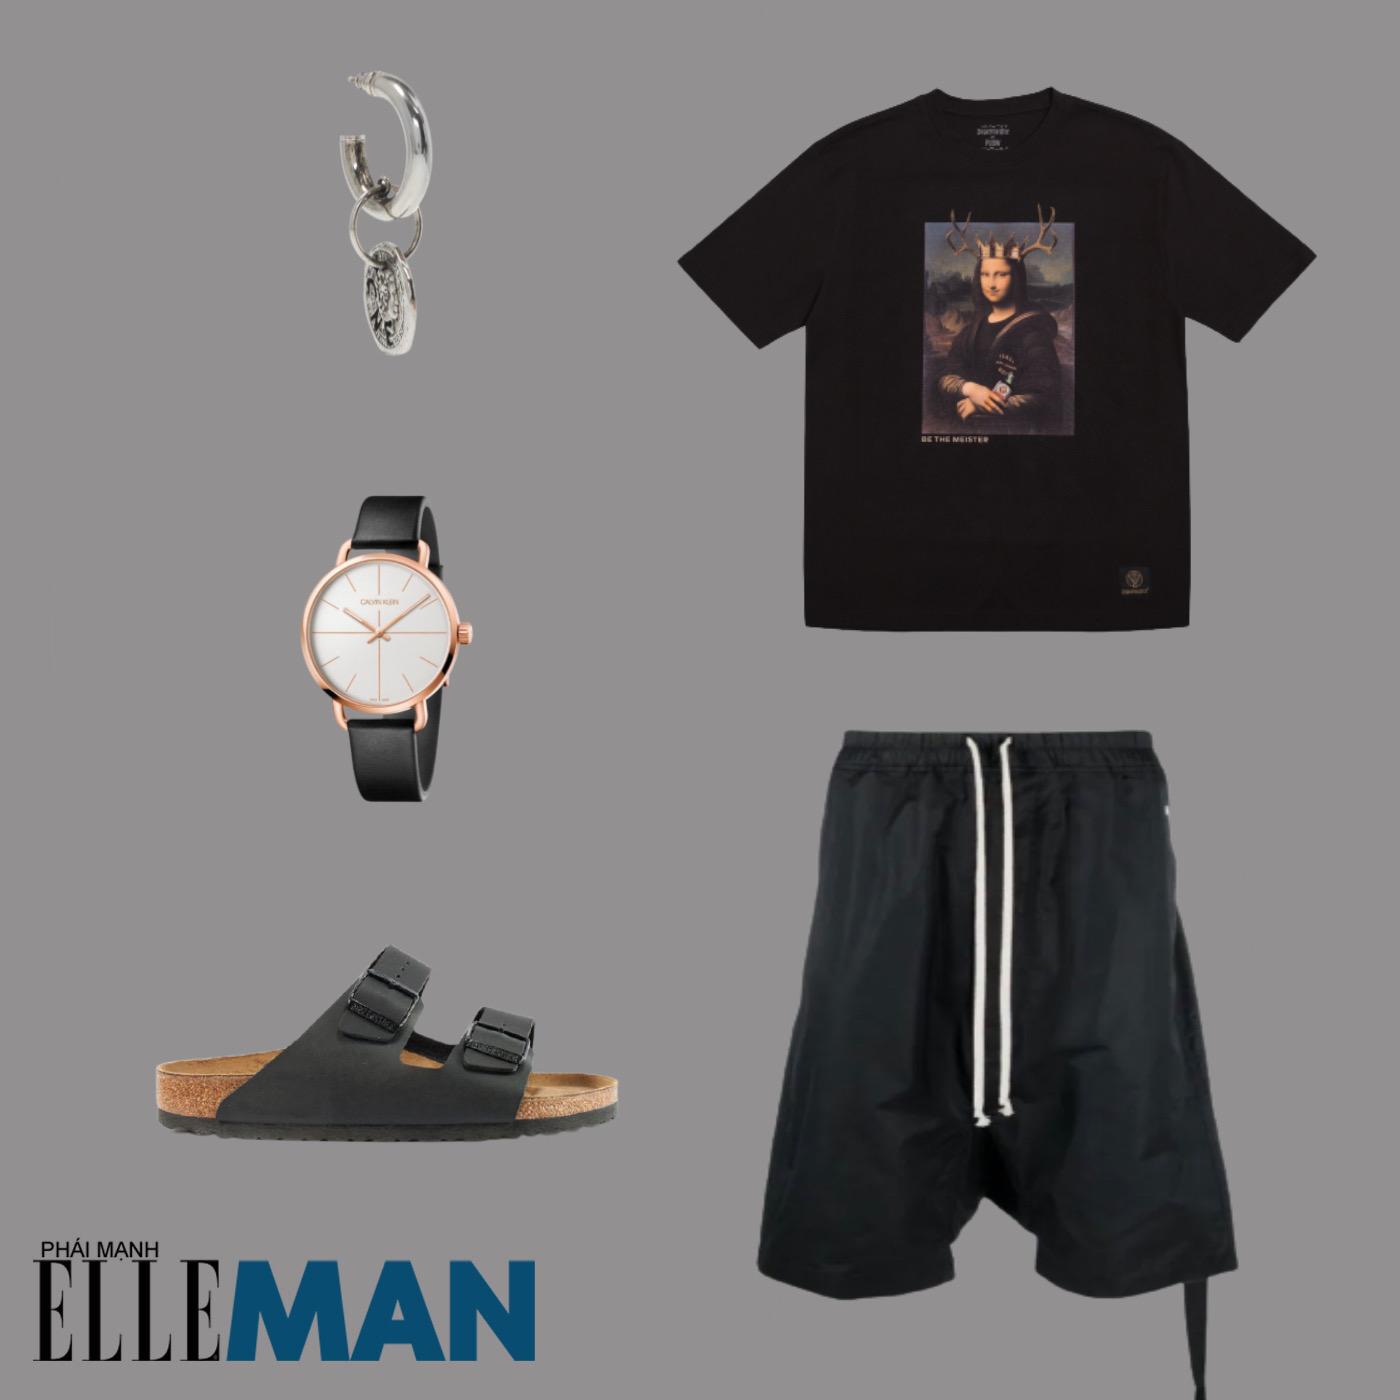 loungewear-ellemanstylecalendar-layout-2.jpeg